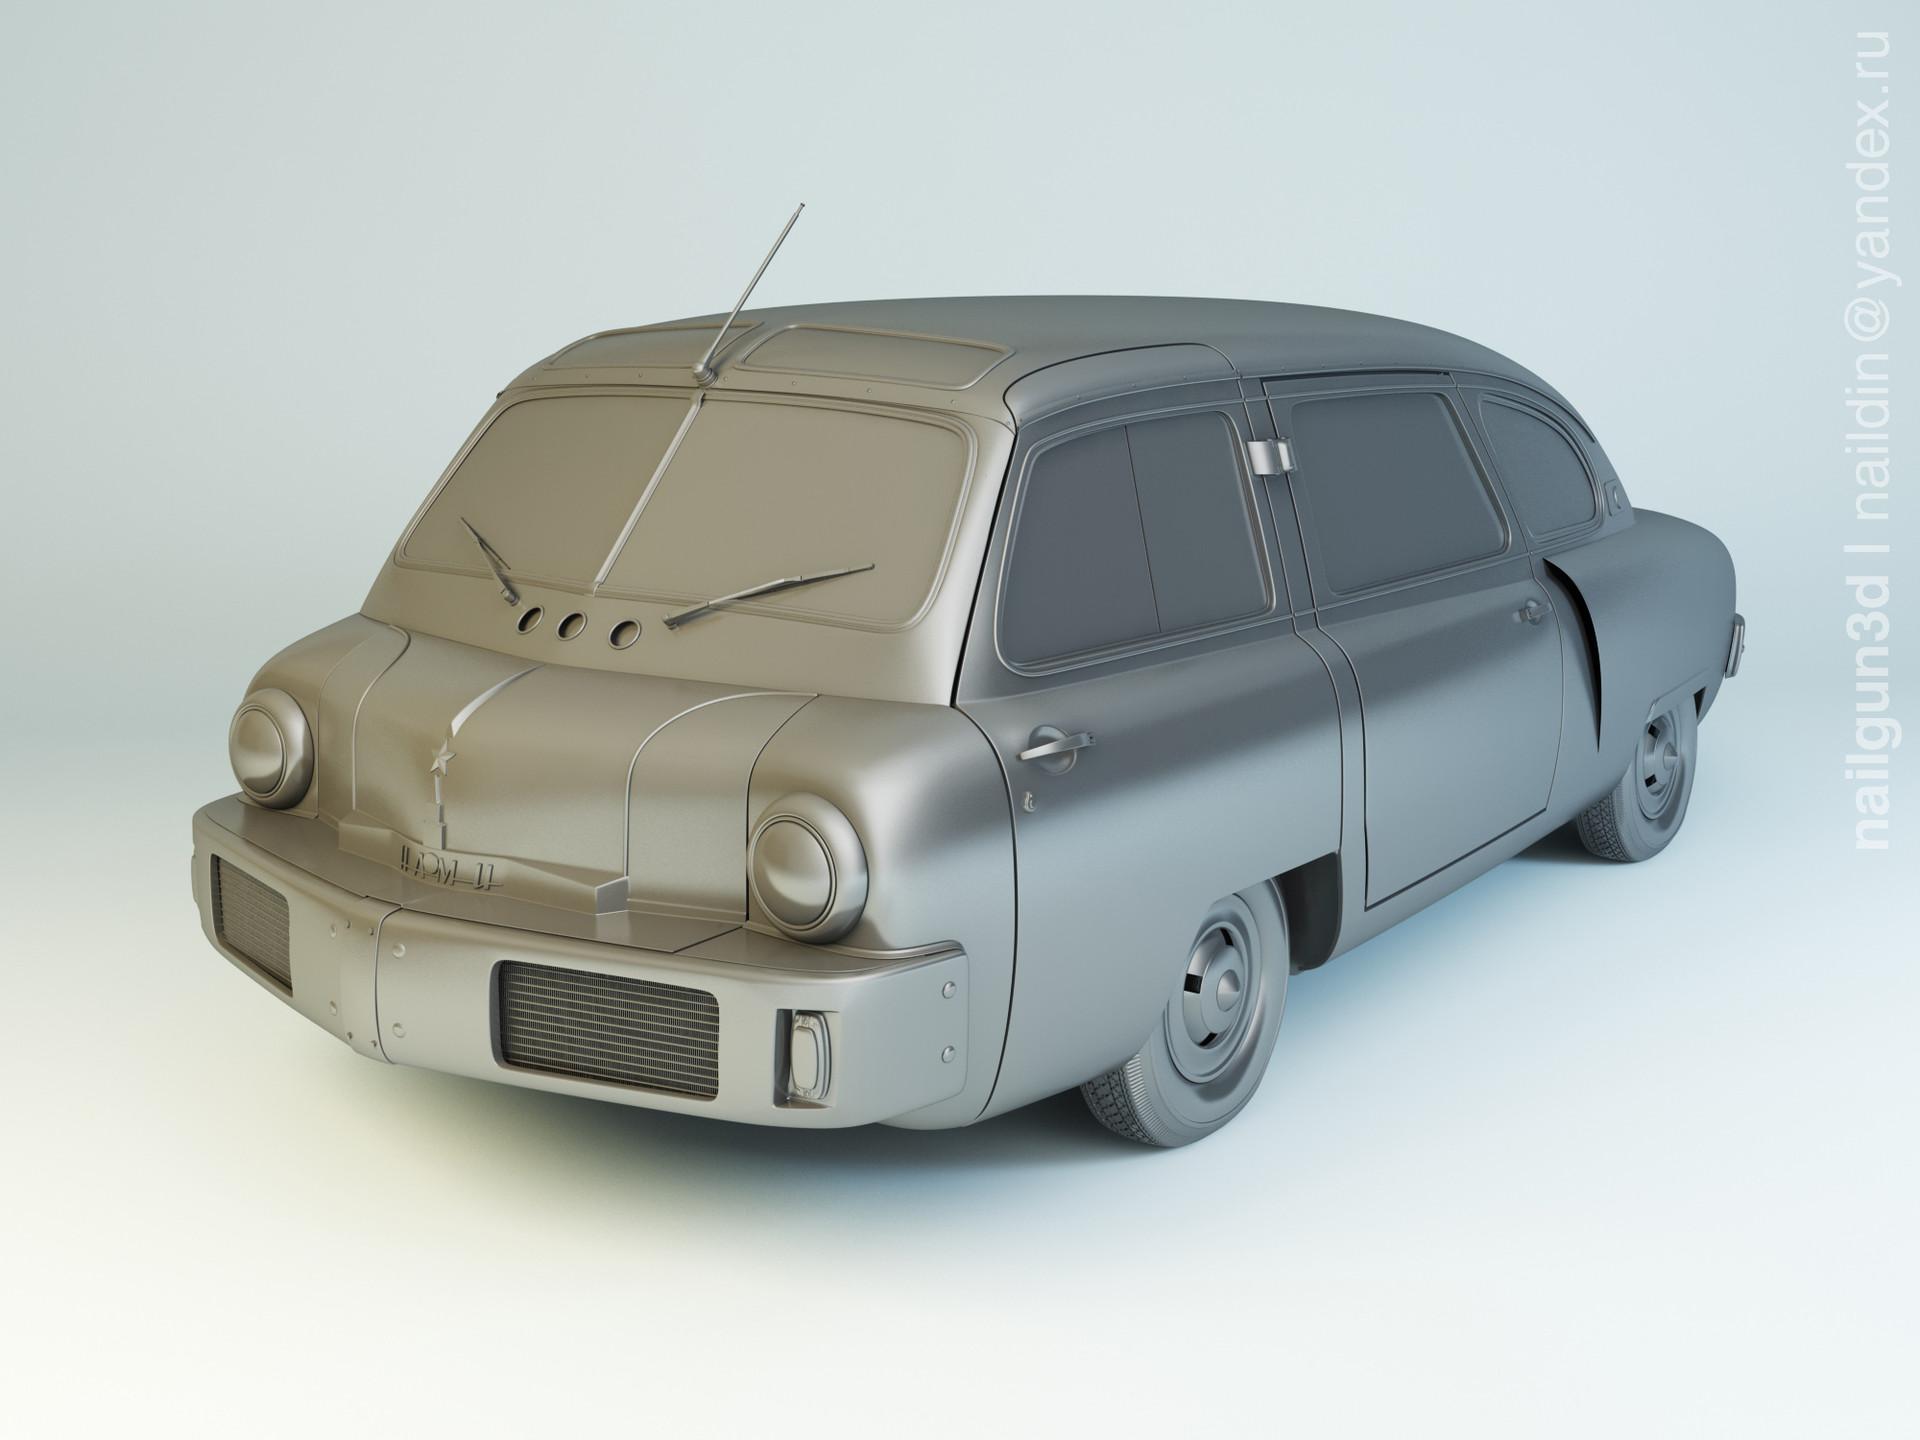 Nail khusnutdinov als 239 006 nami 013 modelling 0